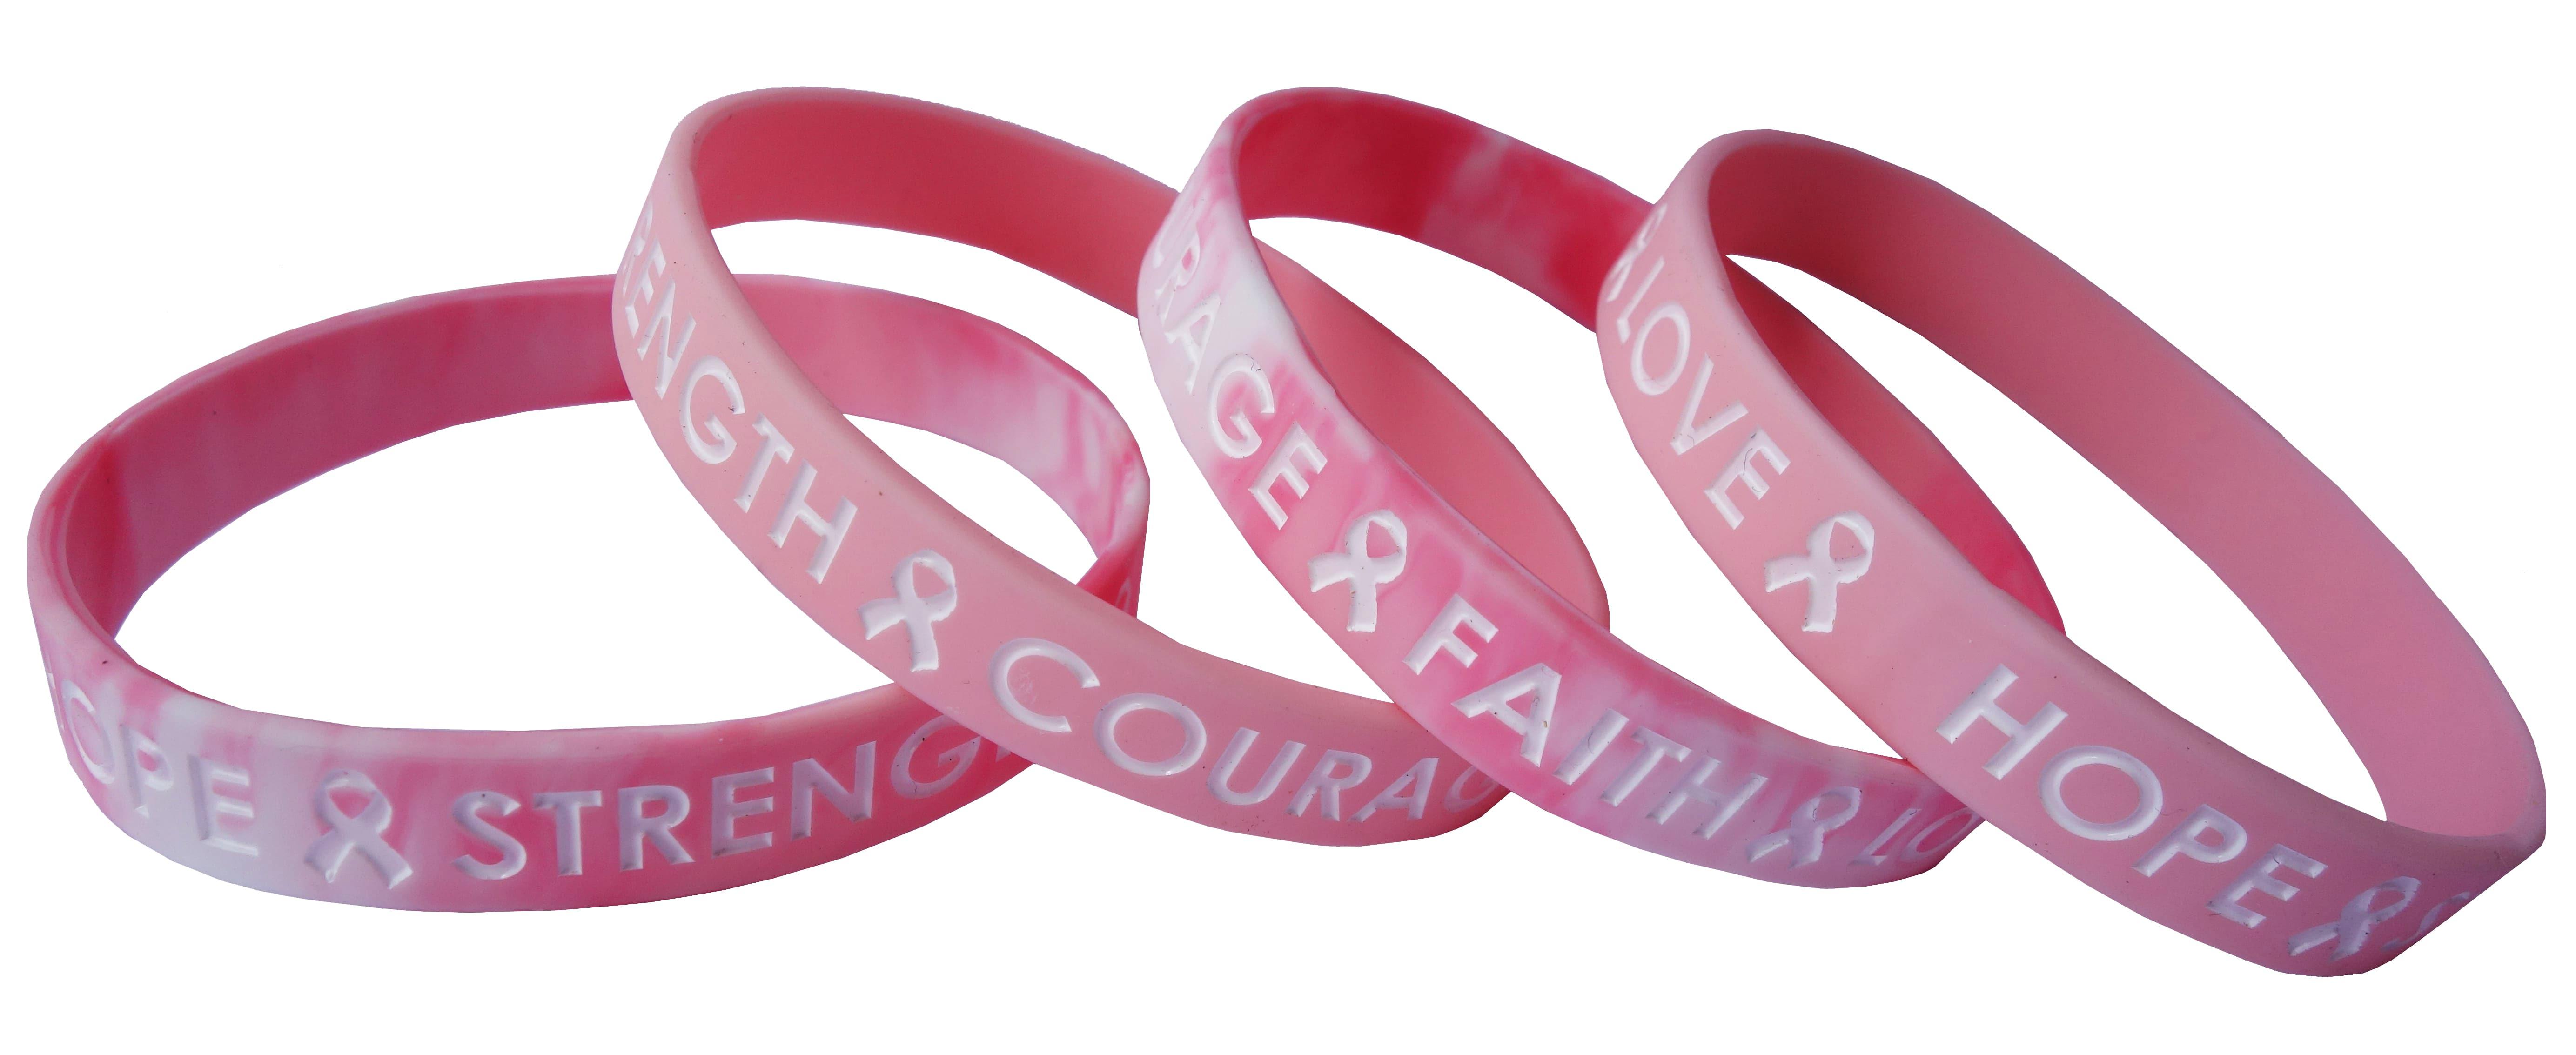 breast cancer awareness wristband 6